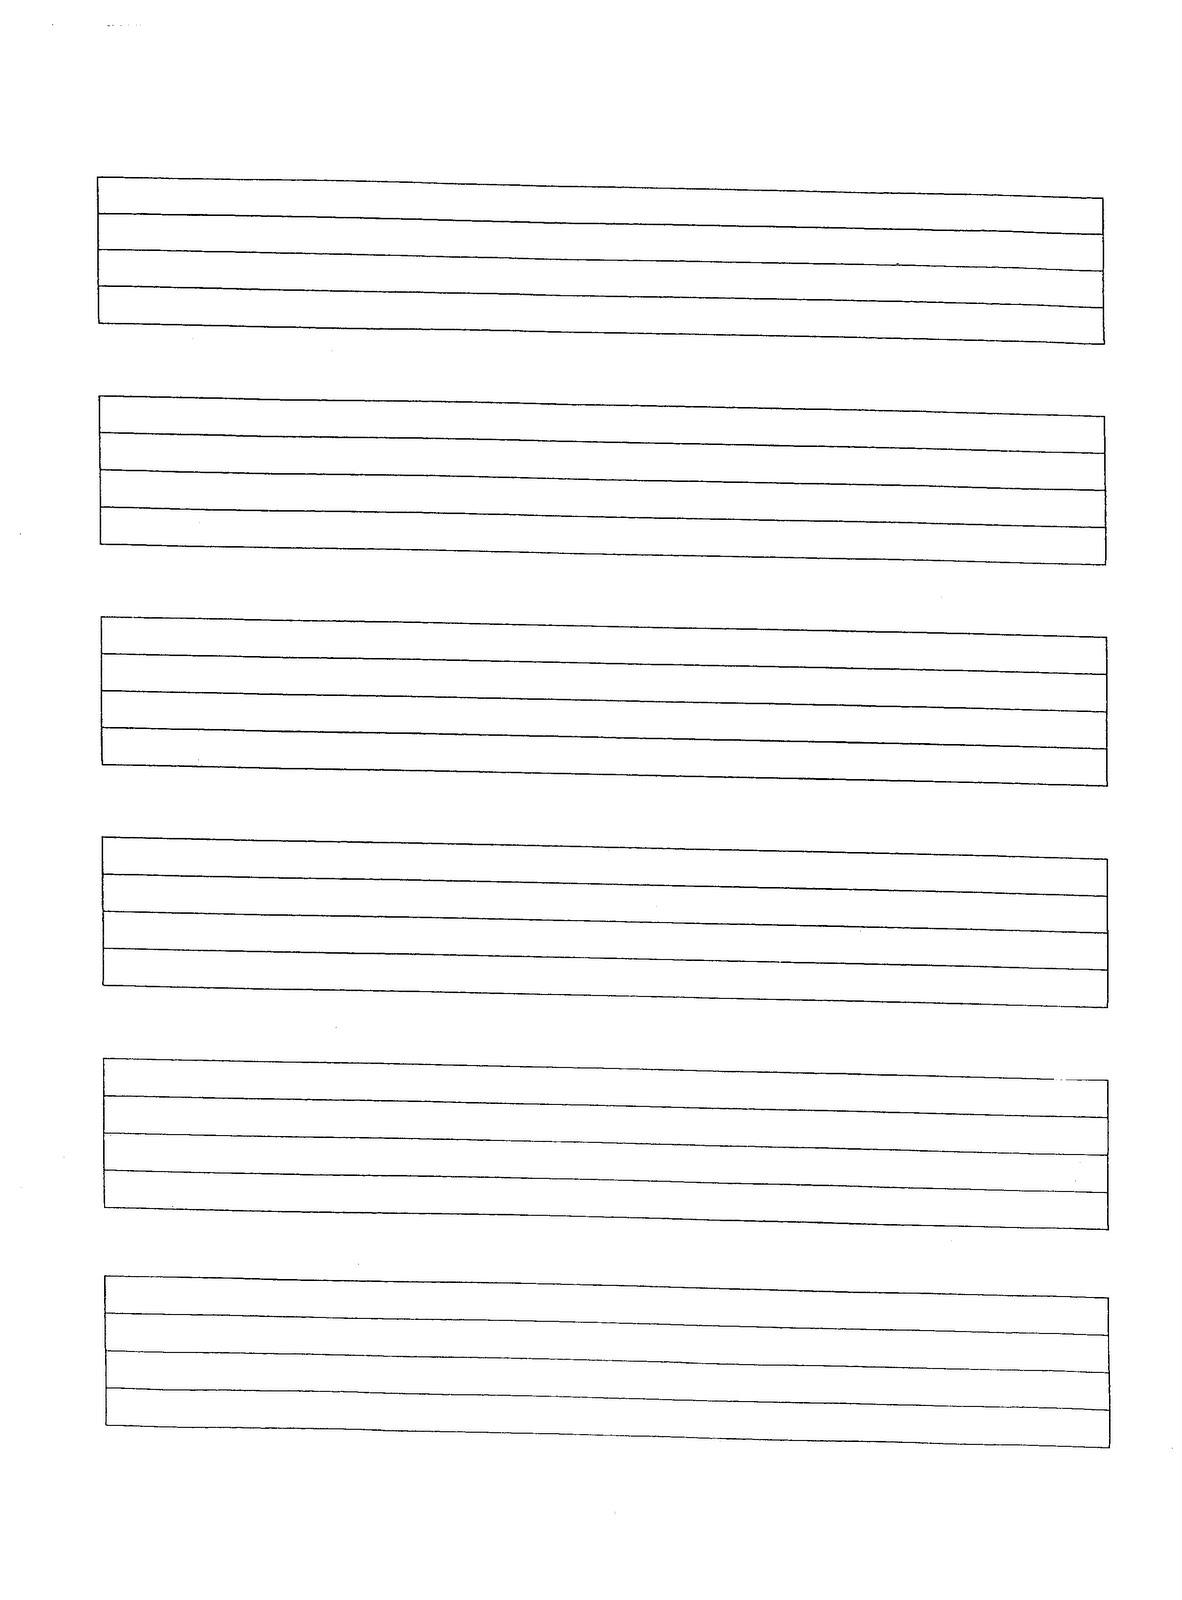 Bass Tab Template Divider Pdf Free Prinatble Blank Staff Paper